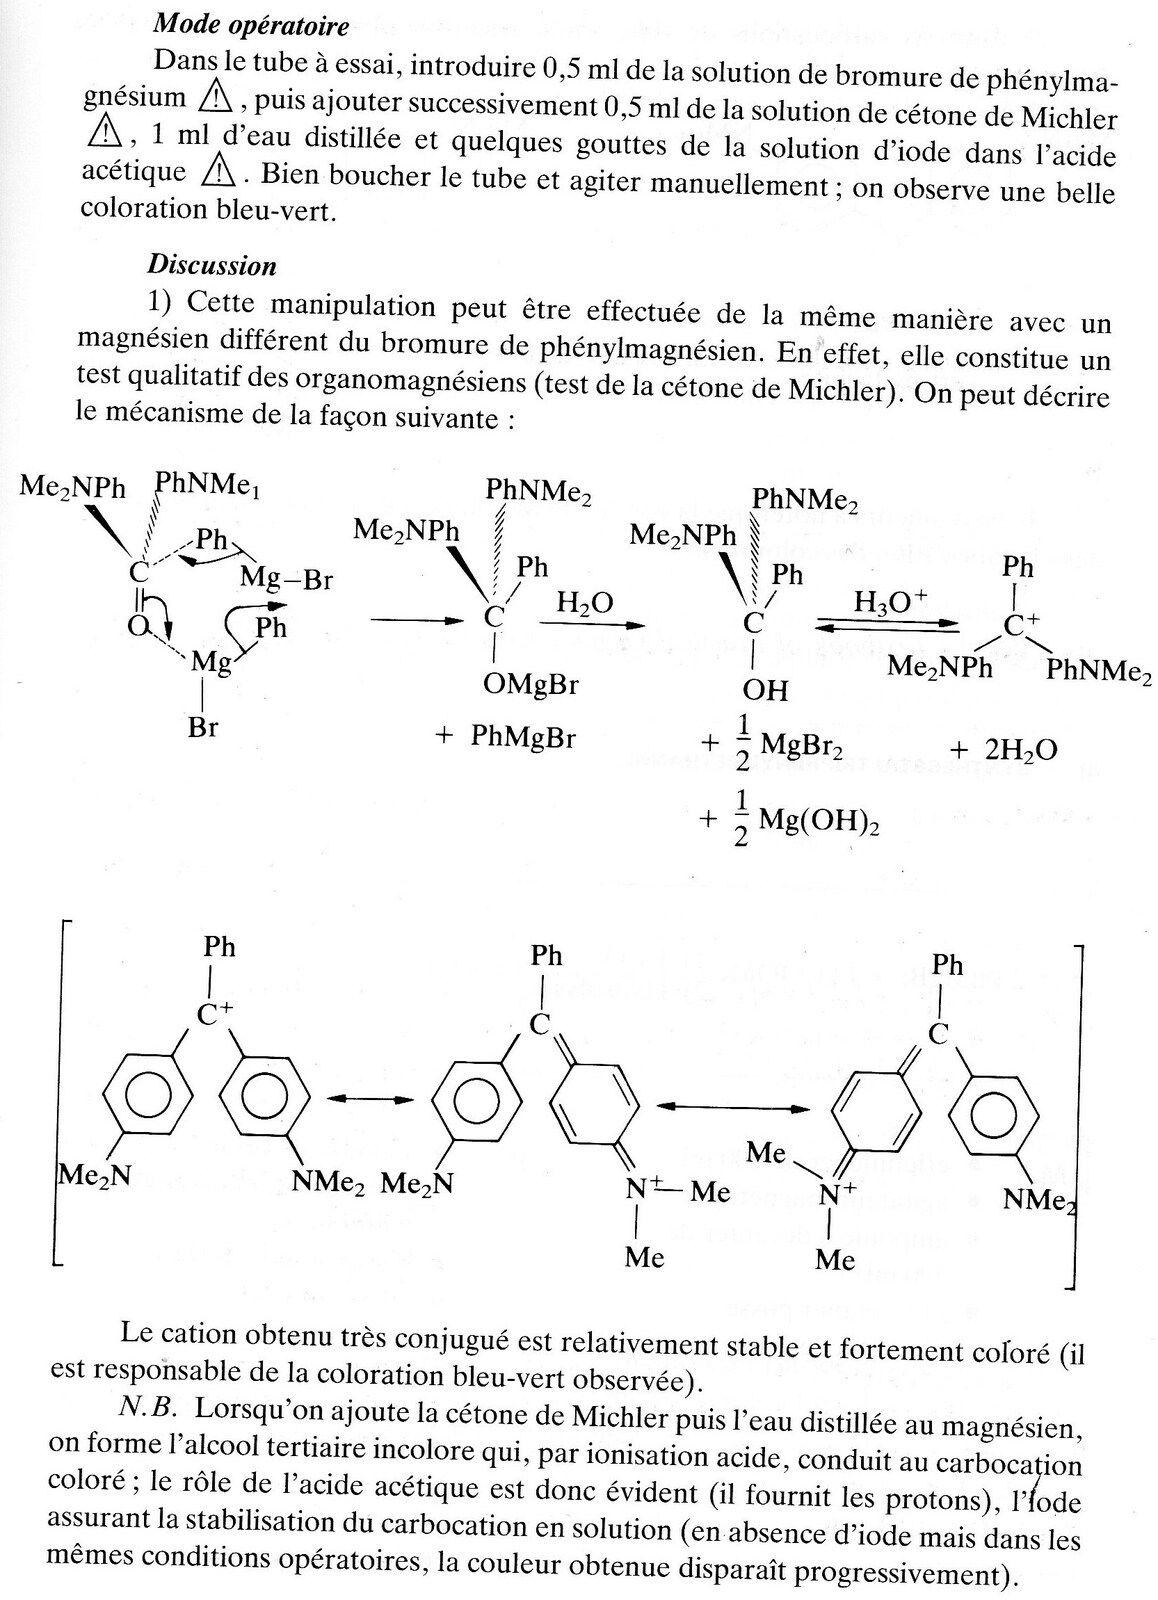 synthèse du vert malachite (voir 219- synthèse du vert mamachite)